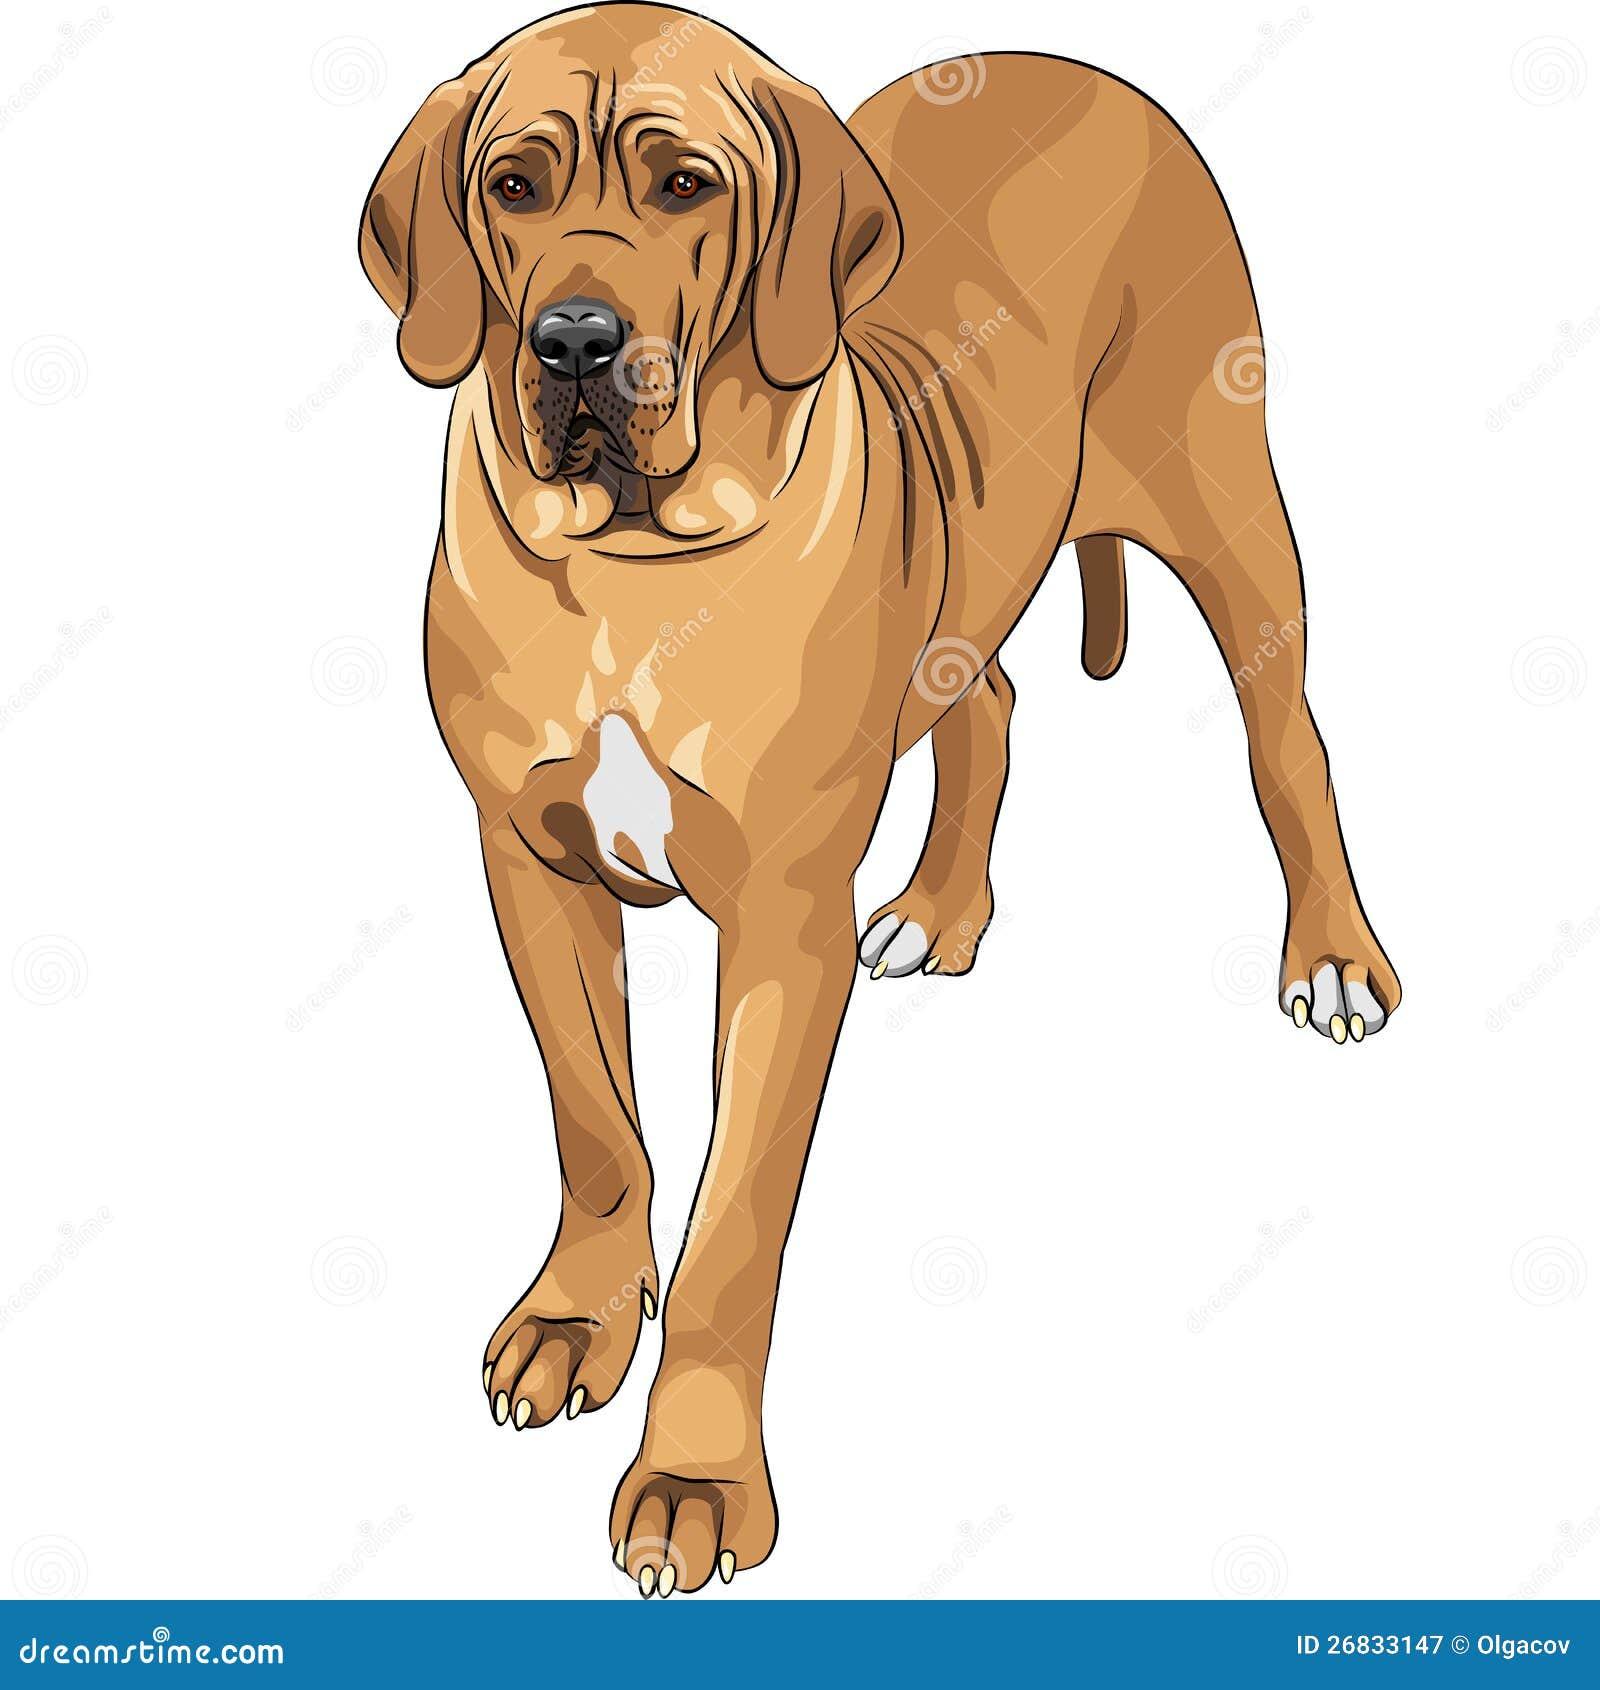 Vektorn skissar den inhemska hunden lismar den stora danskaveln